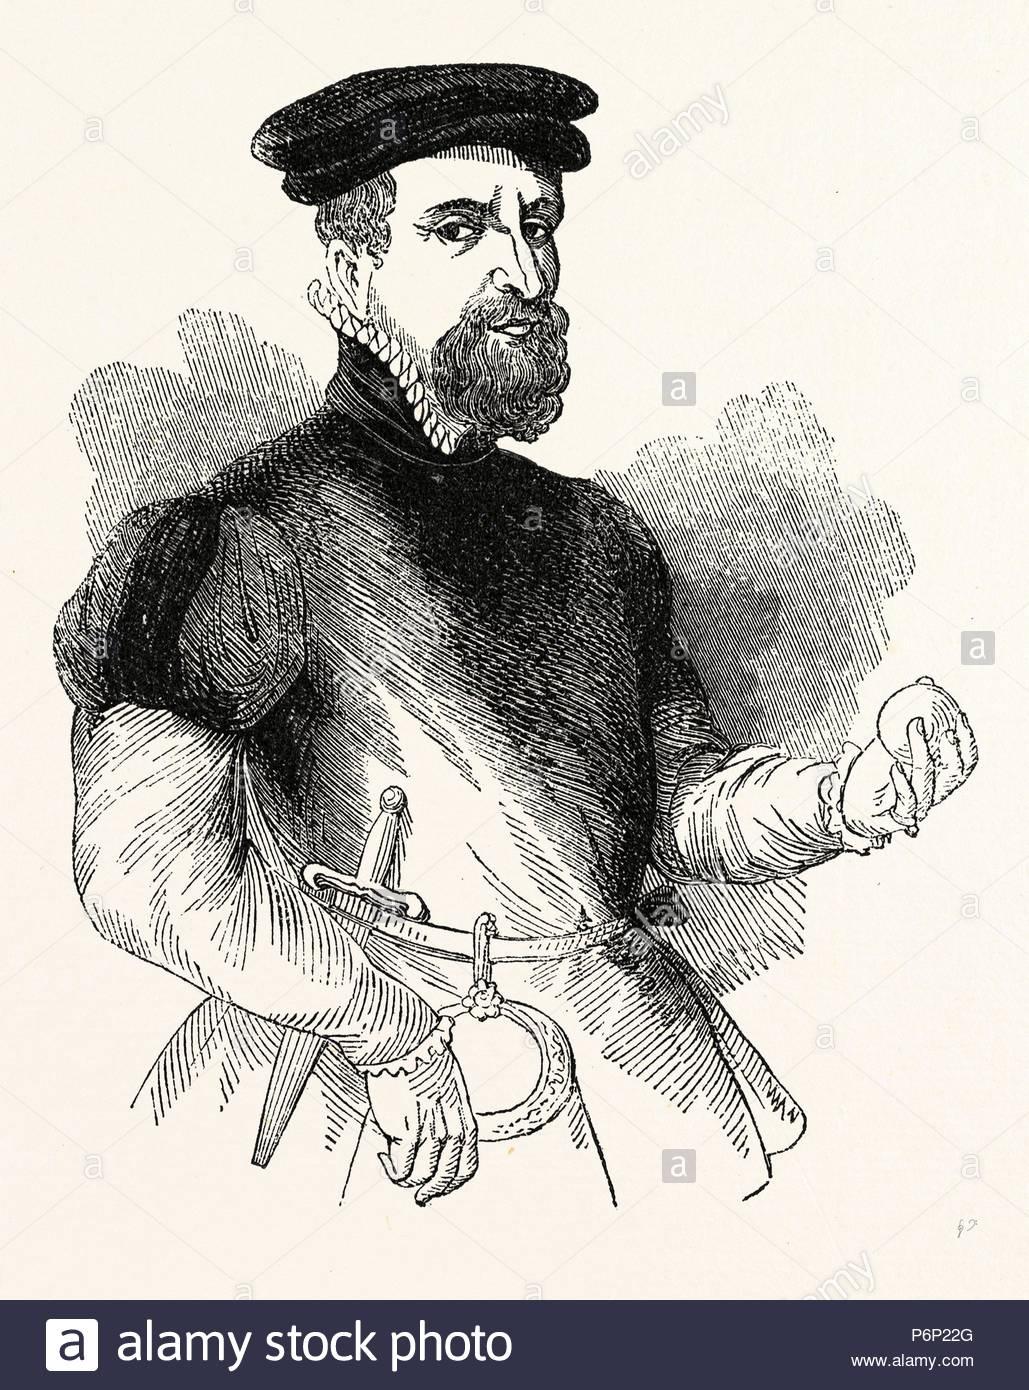 Portrait Sir Thomas Gresham, English merchant and financier, London, England, engraving 19th century, Britain, UK. - Stock Image